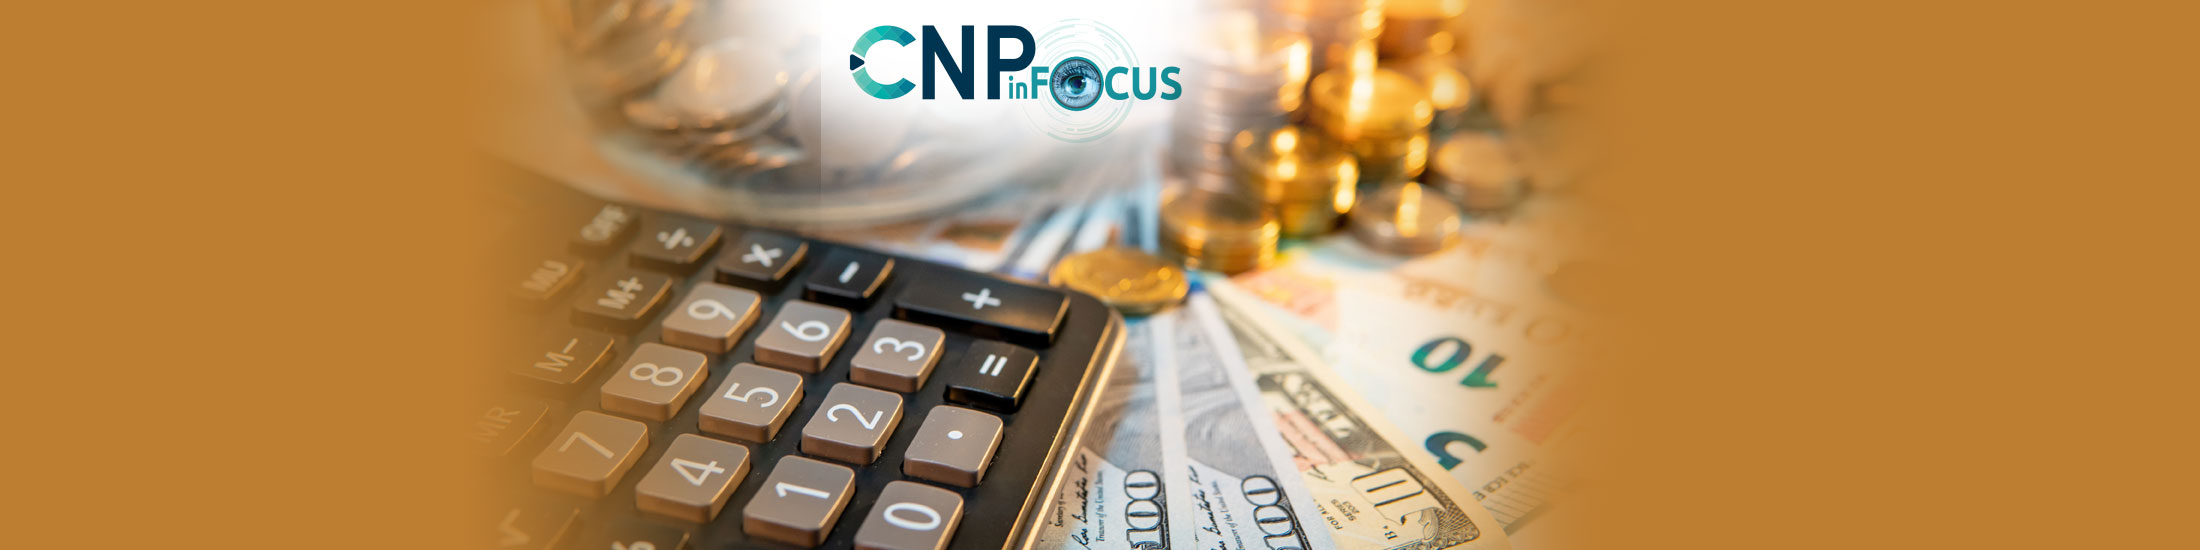 Returns and Refunding Fraud Costing Merchants Millions